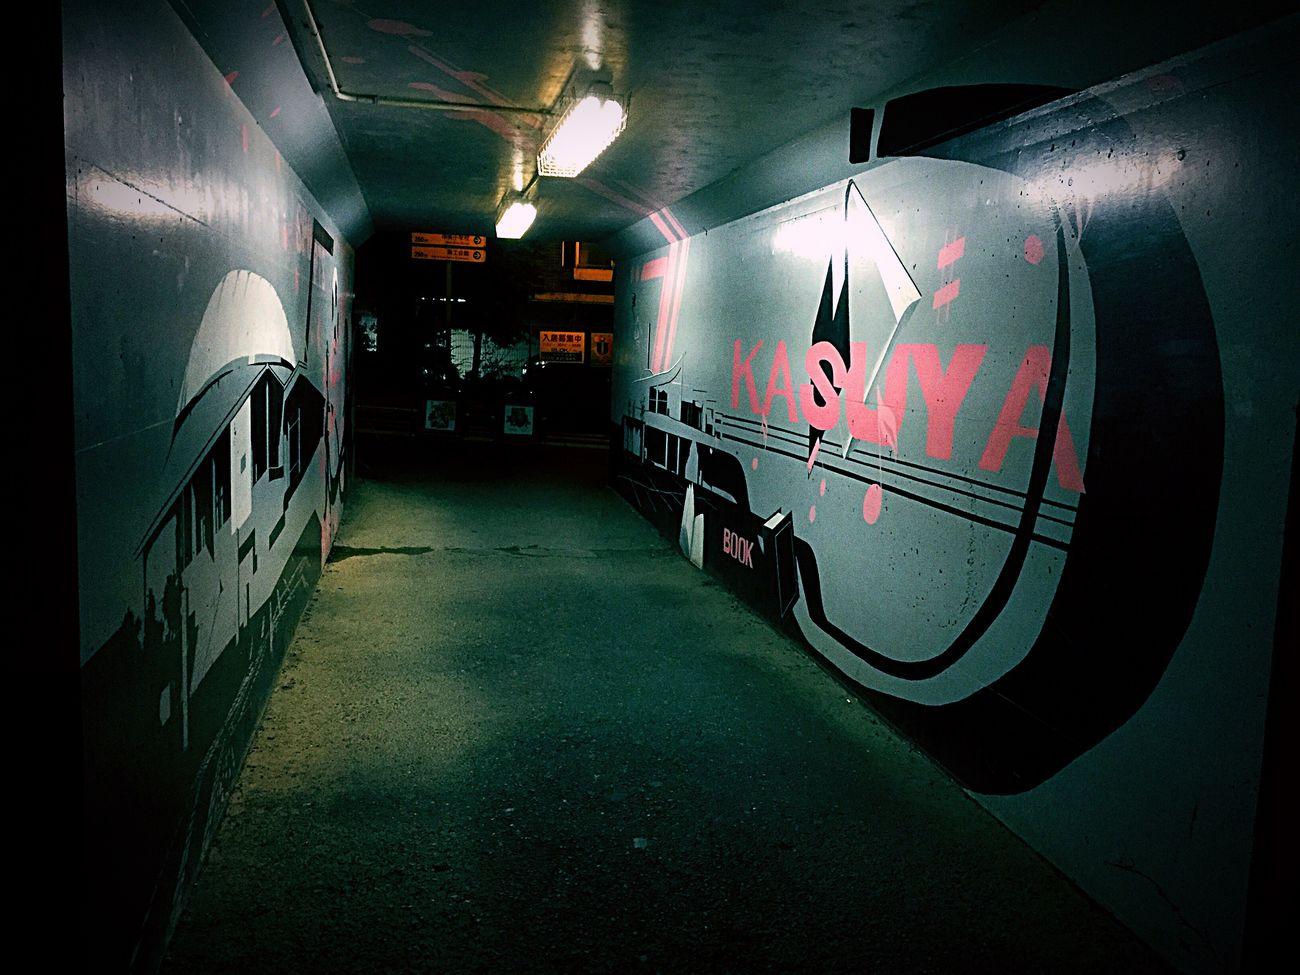 Tunnel No People Graffiti Graffiti Wall Night Station Street At Night Street 駅前 トンネル 夜 なんとなーく 撮ってみた